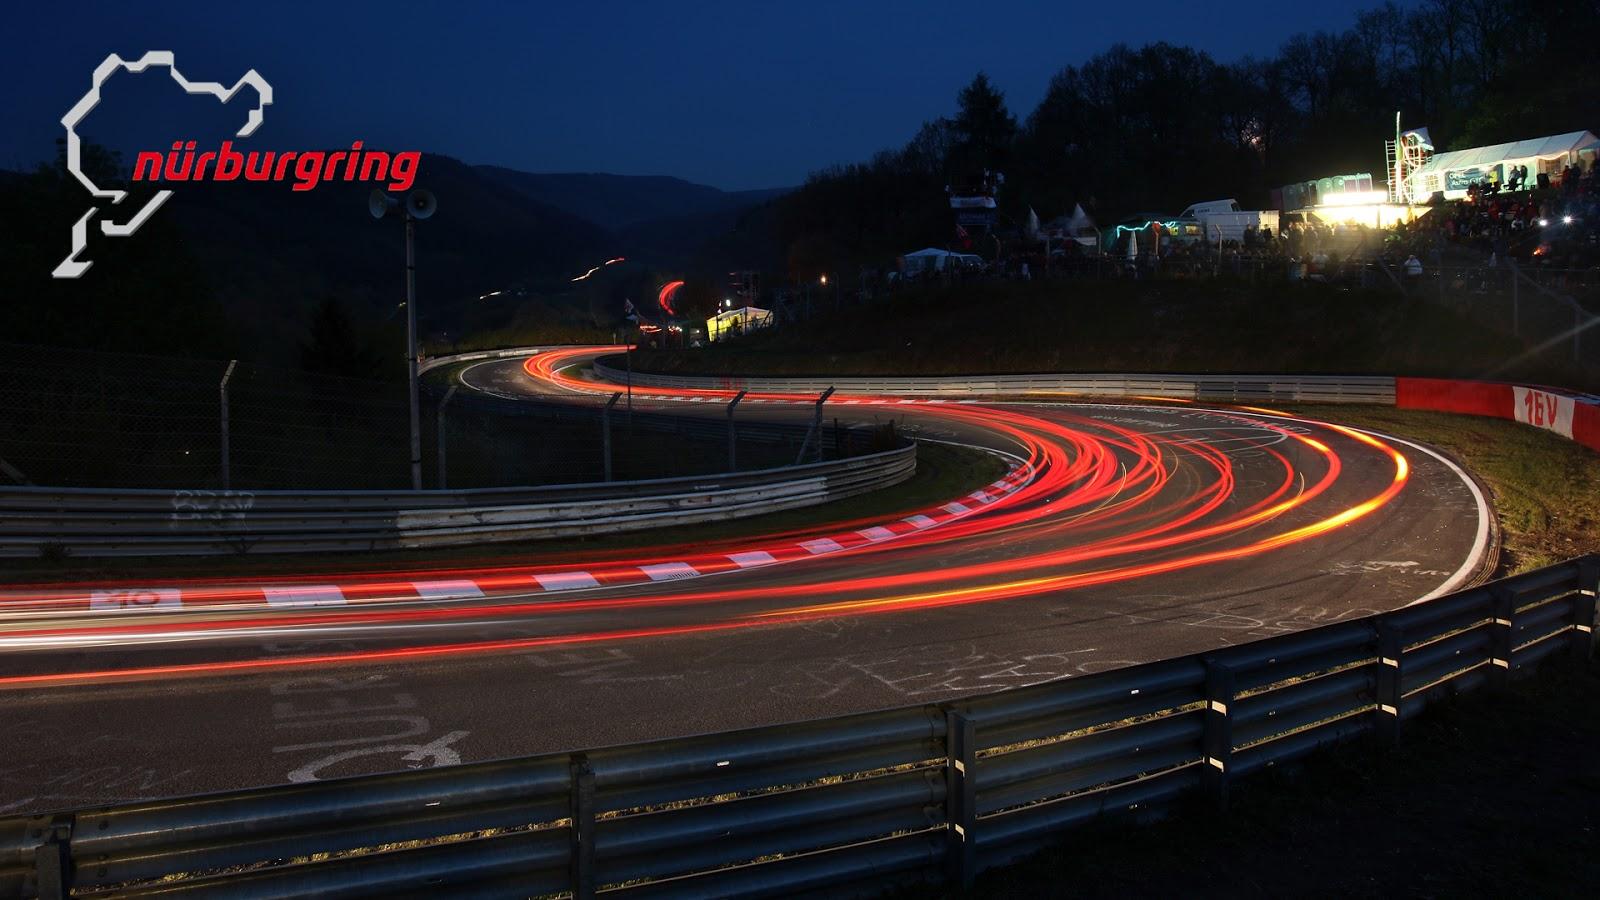 n25C325BCrburgring Χαράς ευαγγέλια για το Koenigsegg One:1, θα ξαναεπιτρέψουν στους κατασκευαστές να χρονομετρούν στην πίστα του Nürburgring Koenigsegg One:1, Nurburgring, Porsche 918 Spyder, Speed Limits, videos